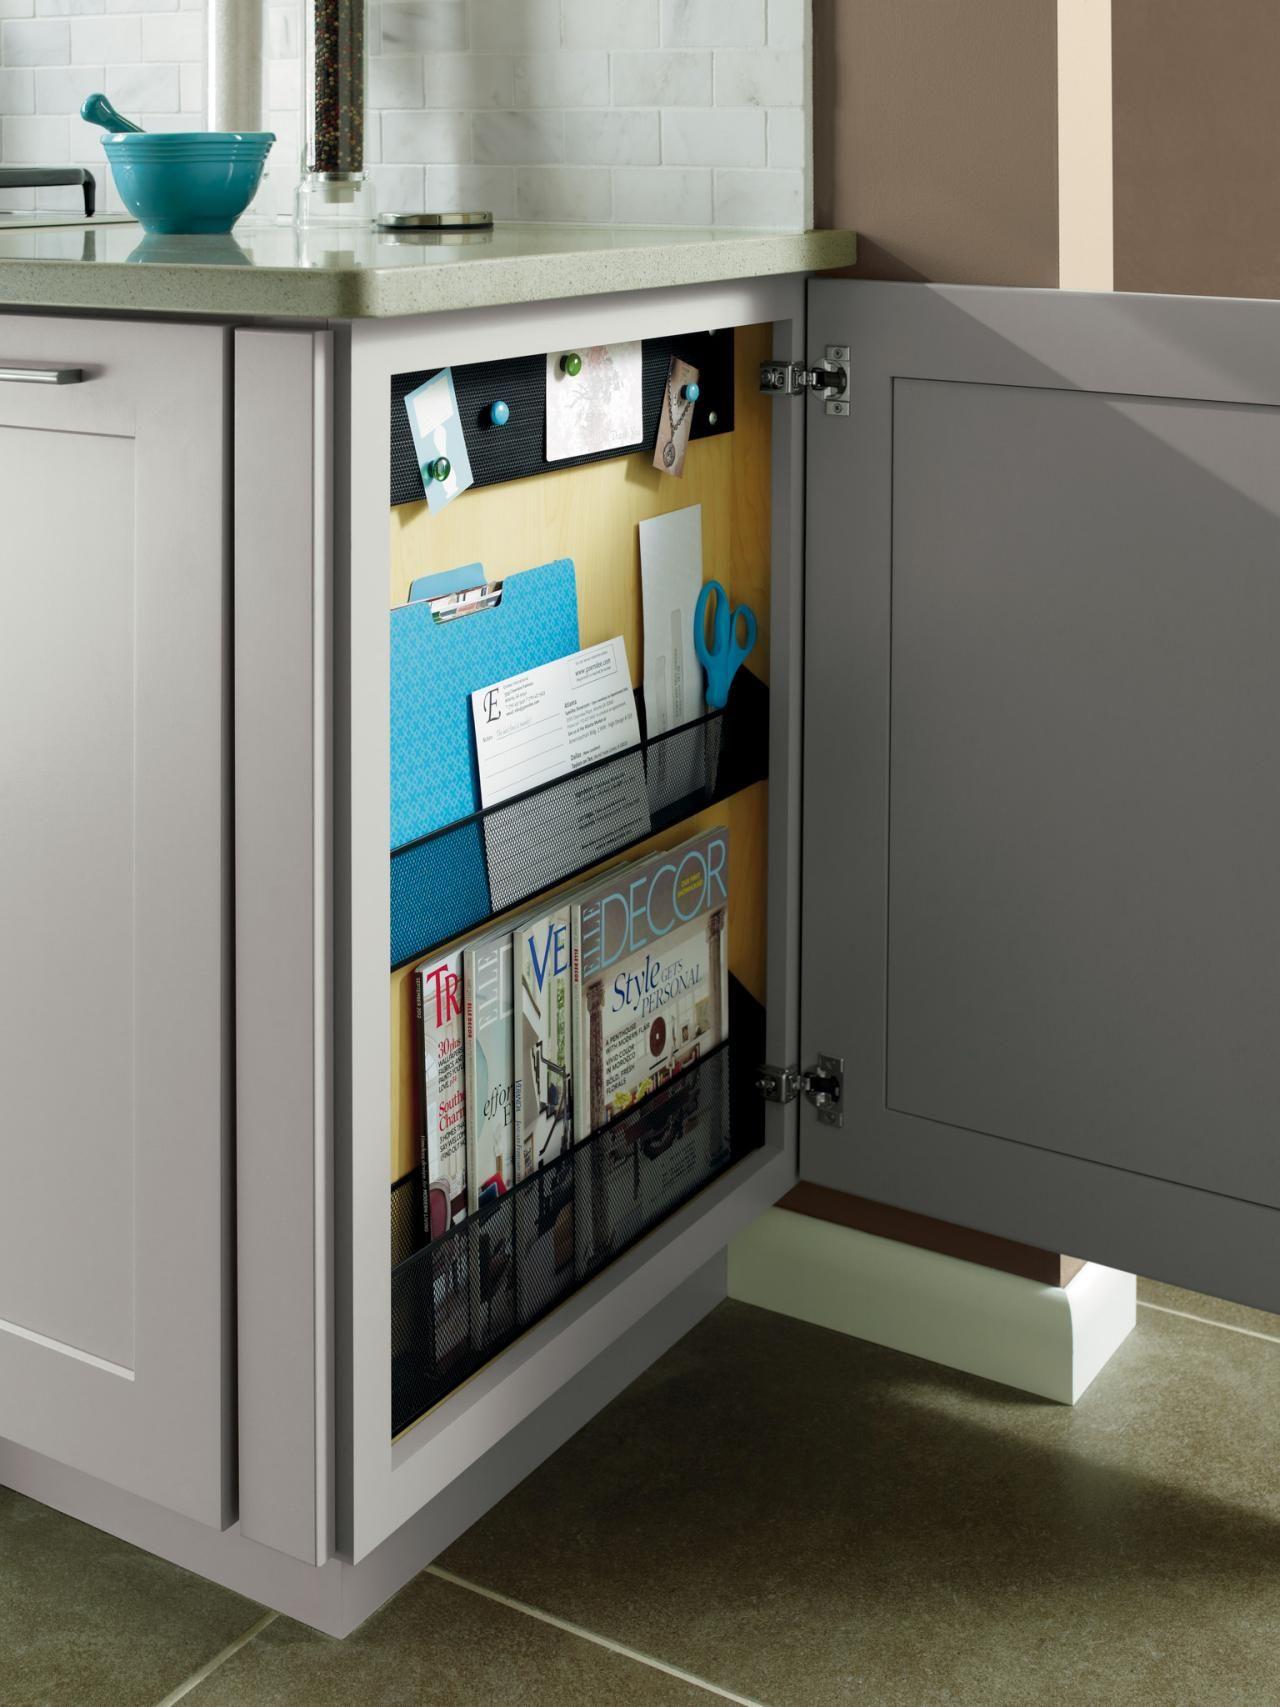 13 Solutions For Common Home Storage Dilemmas Hidden Kitchen Kitchen Cabinet Organization Cabinet Door Styles